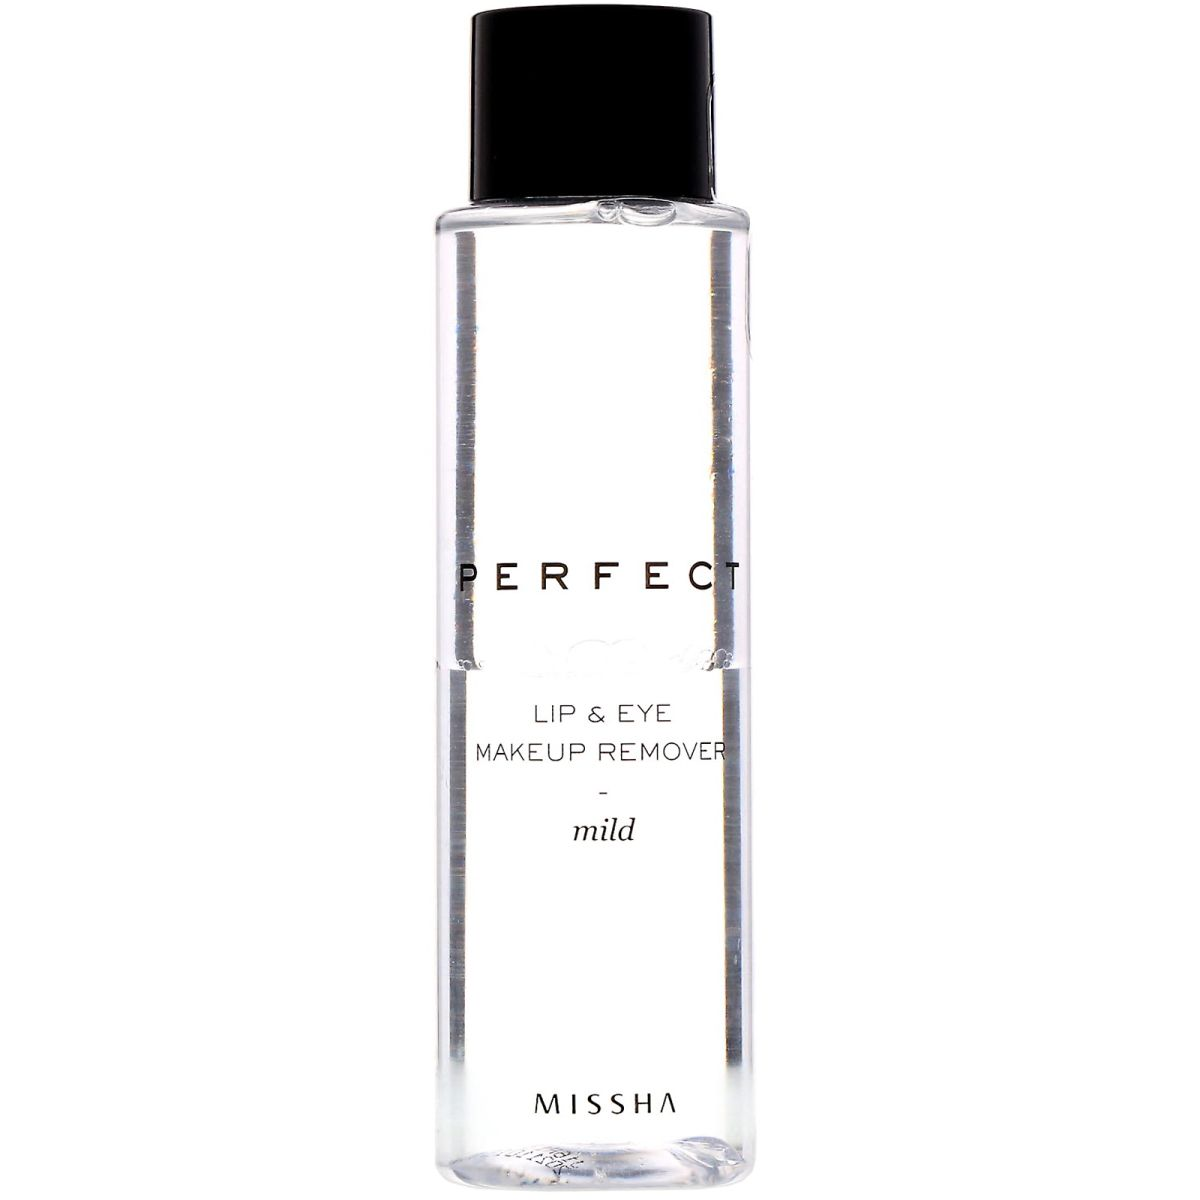 Средство для снятия макияжа MISSHA Perfect Lip & Eye Make-Up Remover (Mild) - 155 мл